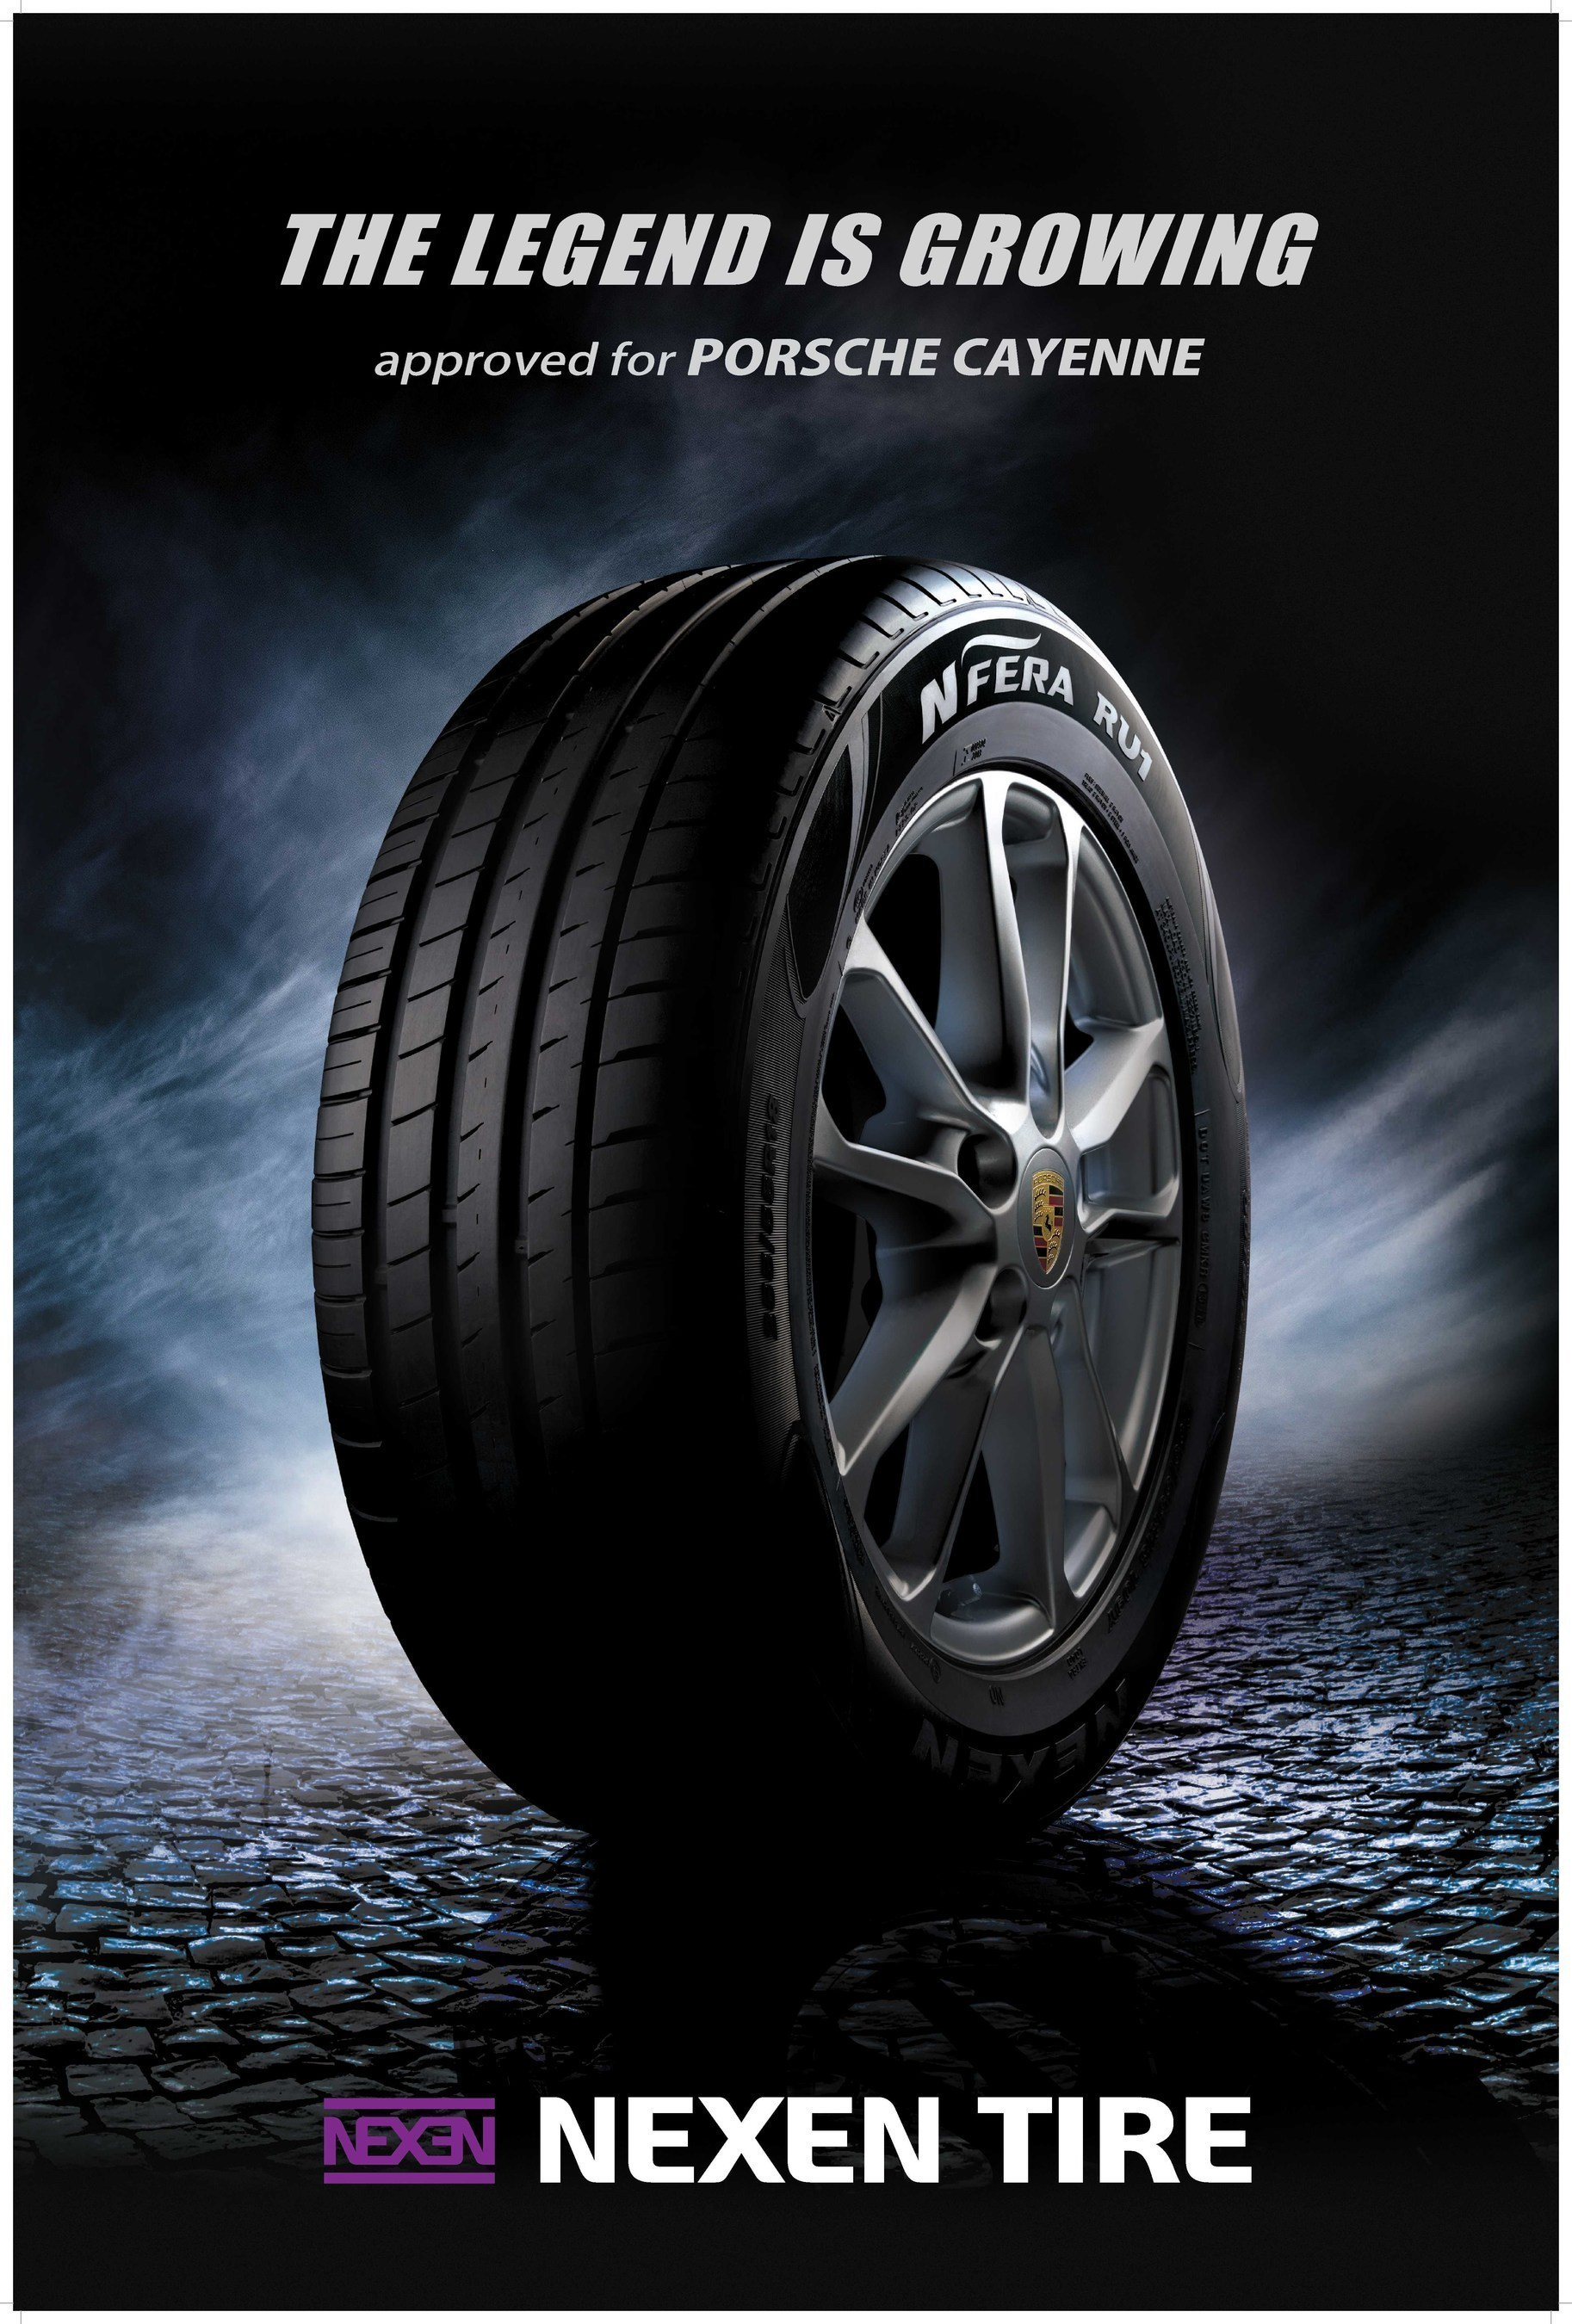 Nexen Tire Supplies Original Equipment Tires for the Porsche Cayenne